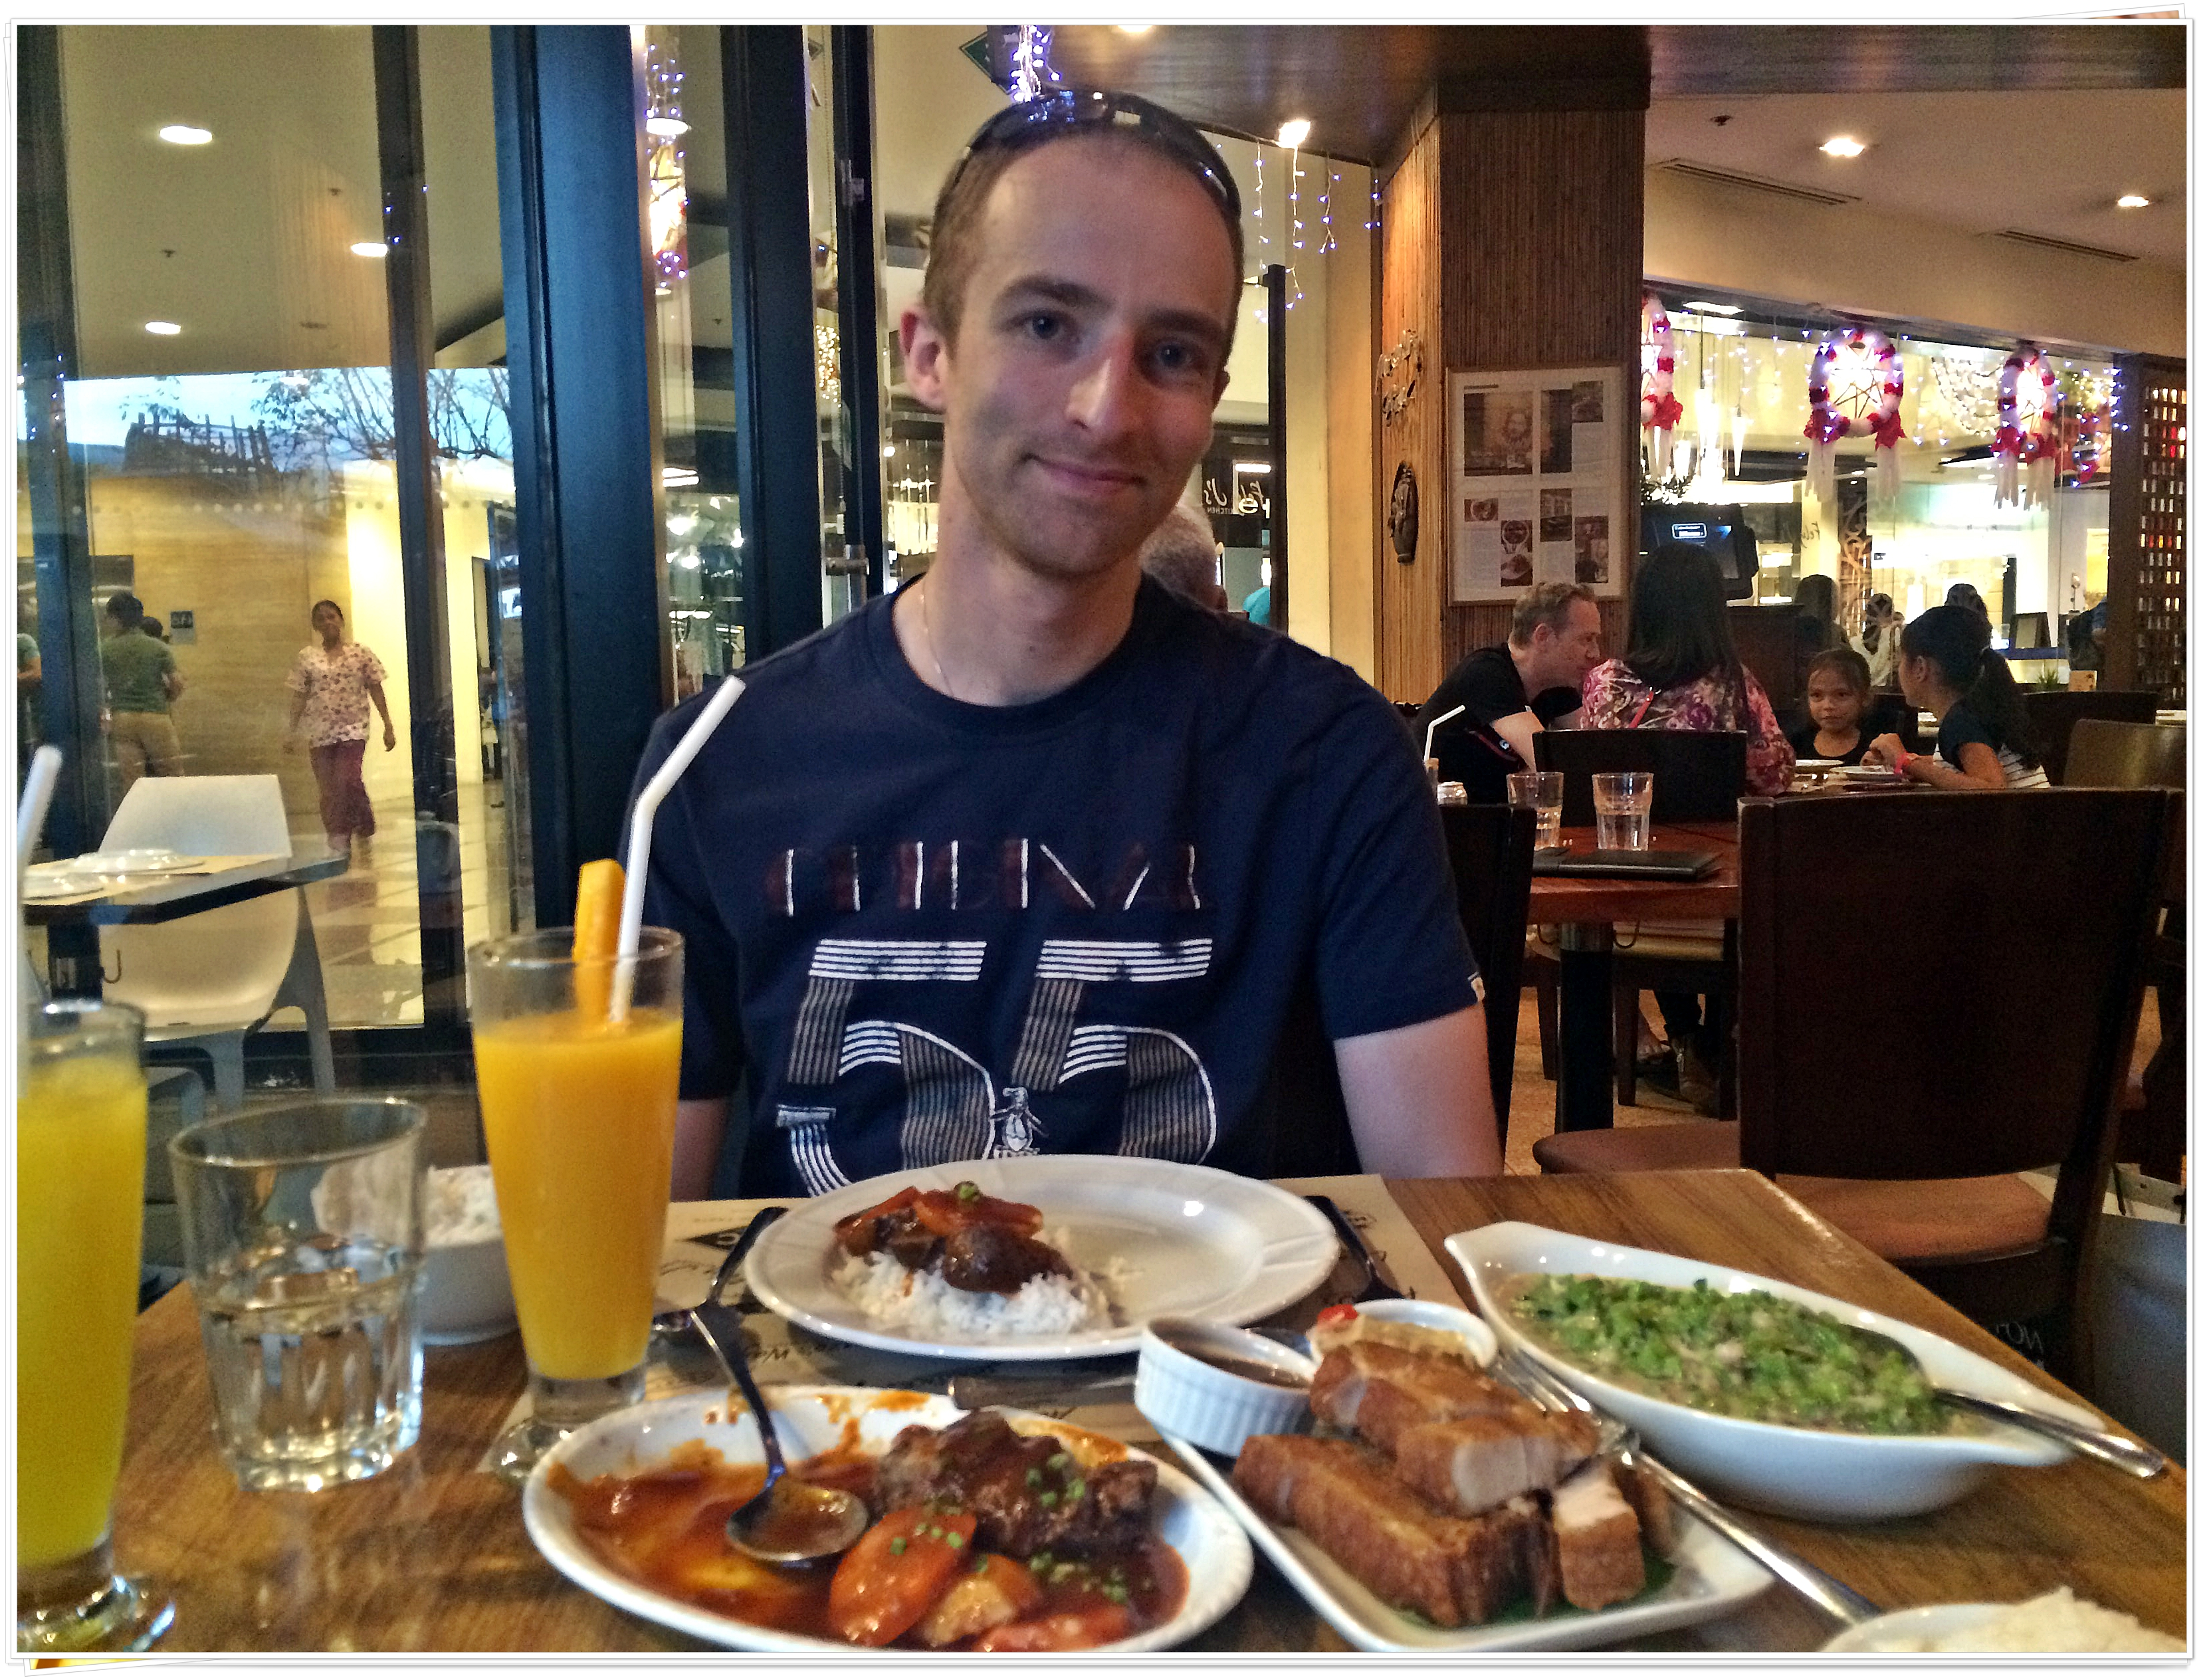 06_2015 PhilTrip - Manila (Fely J's, Greenbelt)